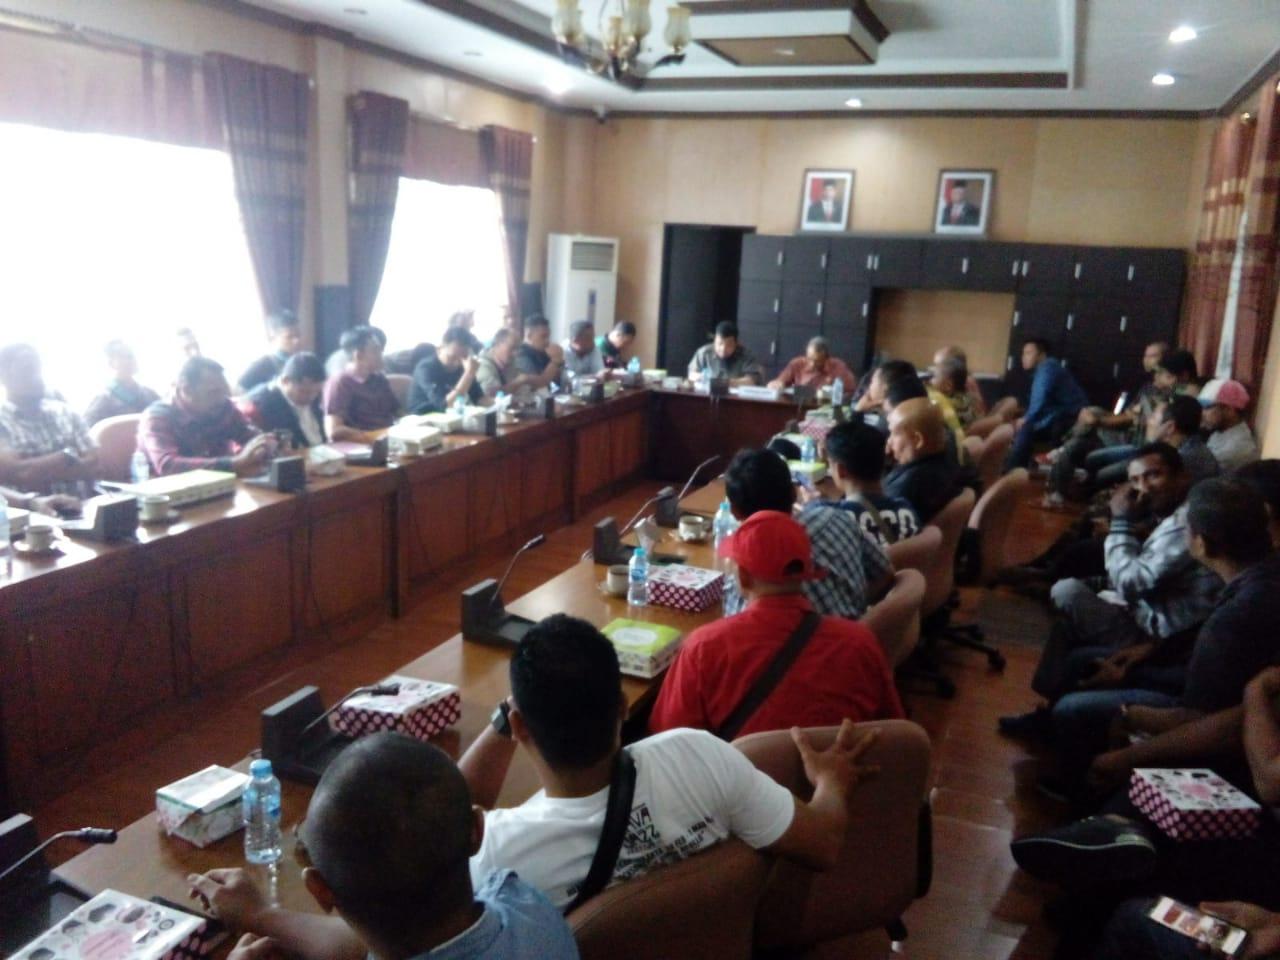 Caption: Pertemuan Komisi V DPRD Provinsi Kalbar dengan Pekerja Outsourcing PT Haleyora Powerindo, Kamis (05/03/2020).